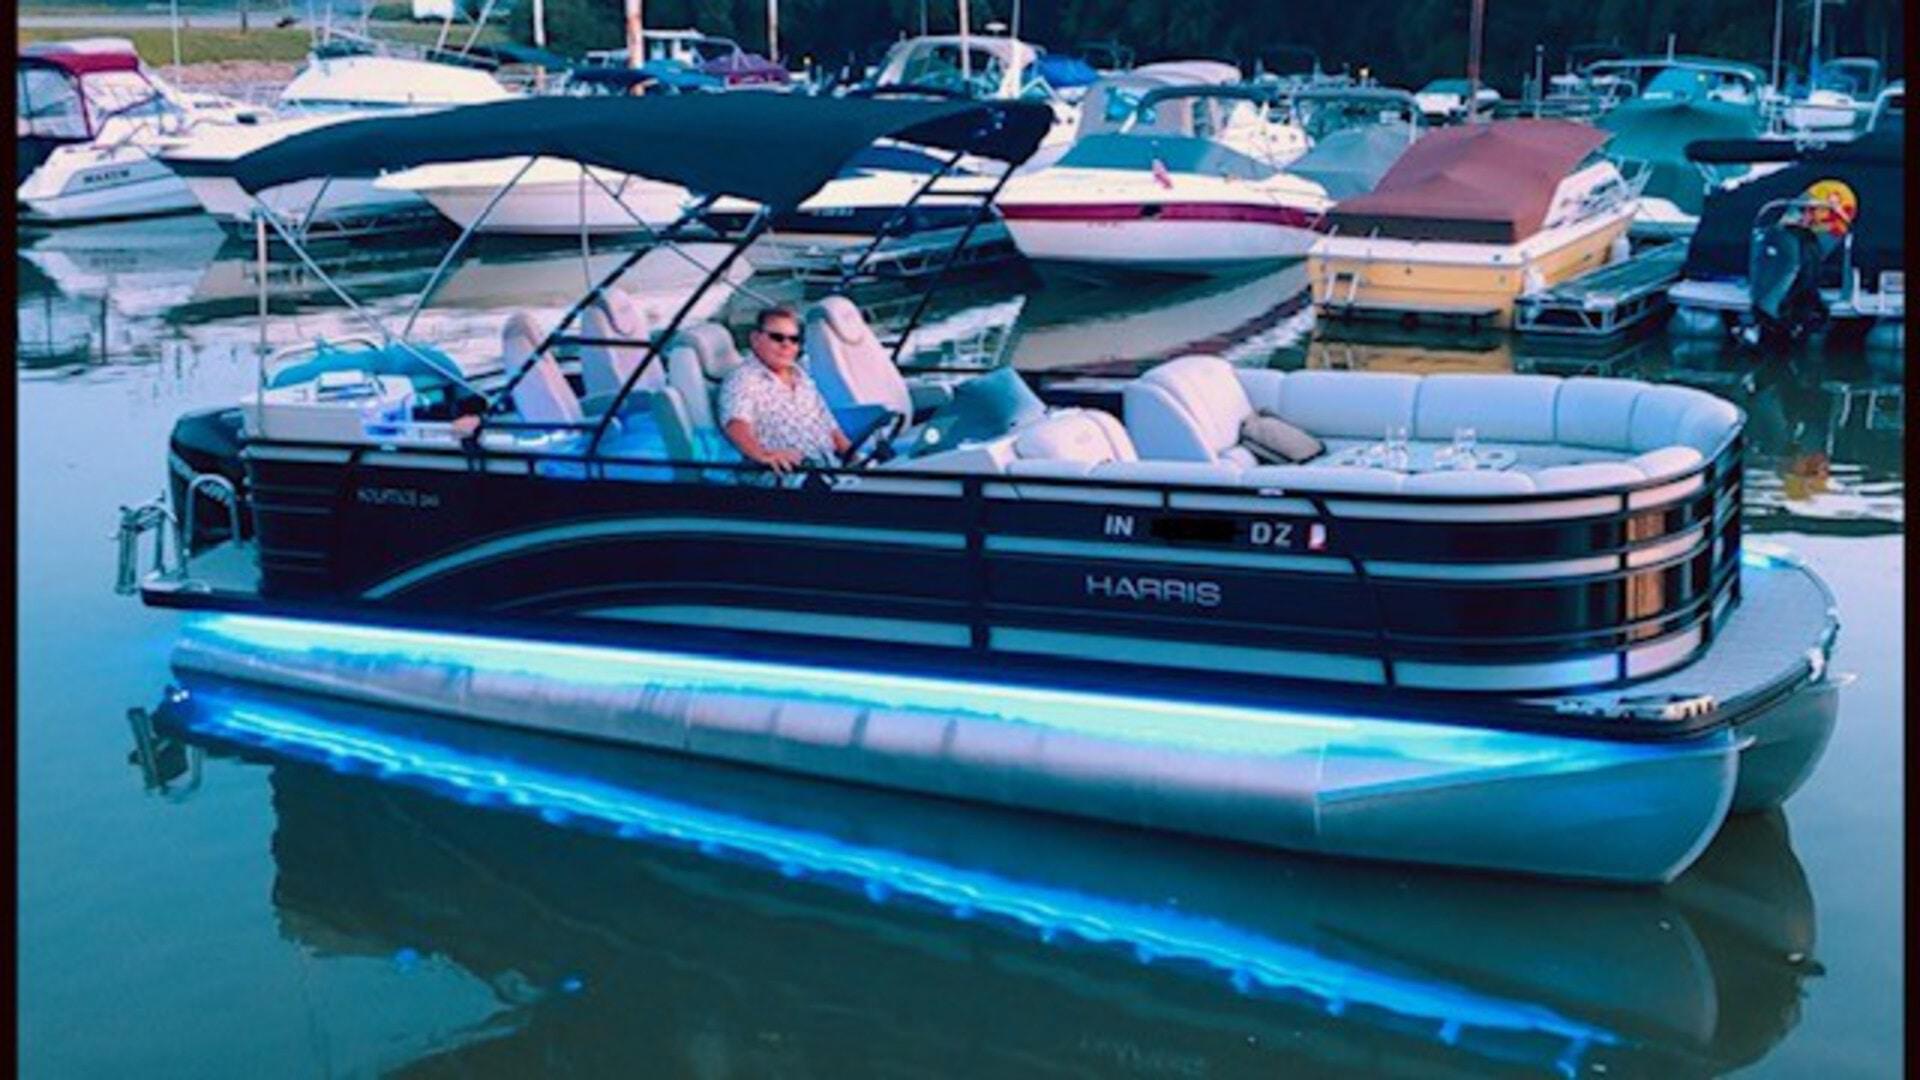 Used, 2018, Harris Flotebote, SOLSTICE 240  EGDH BAR BOAT, Boats